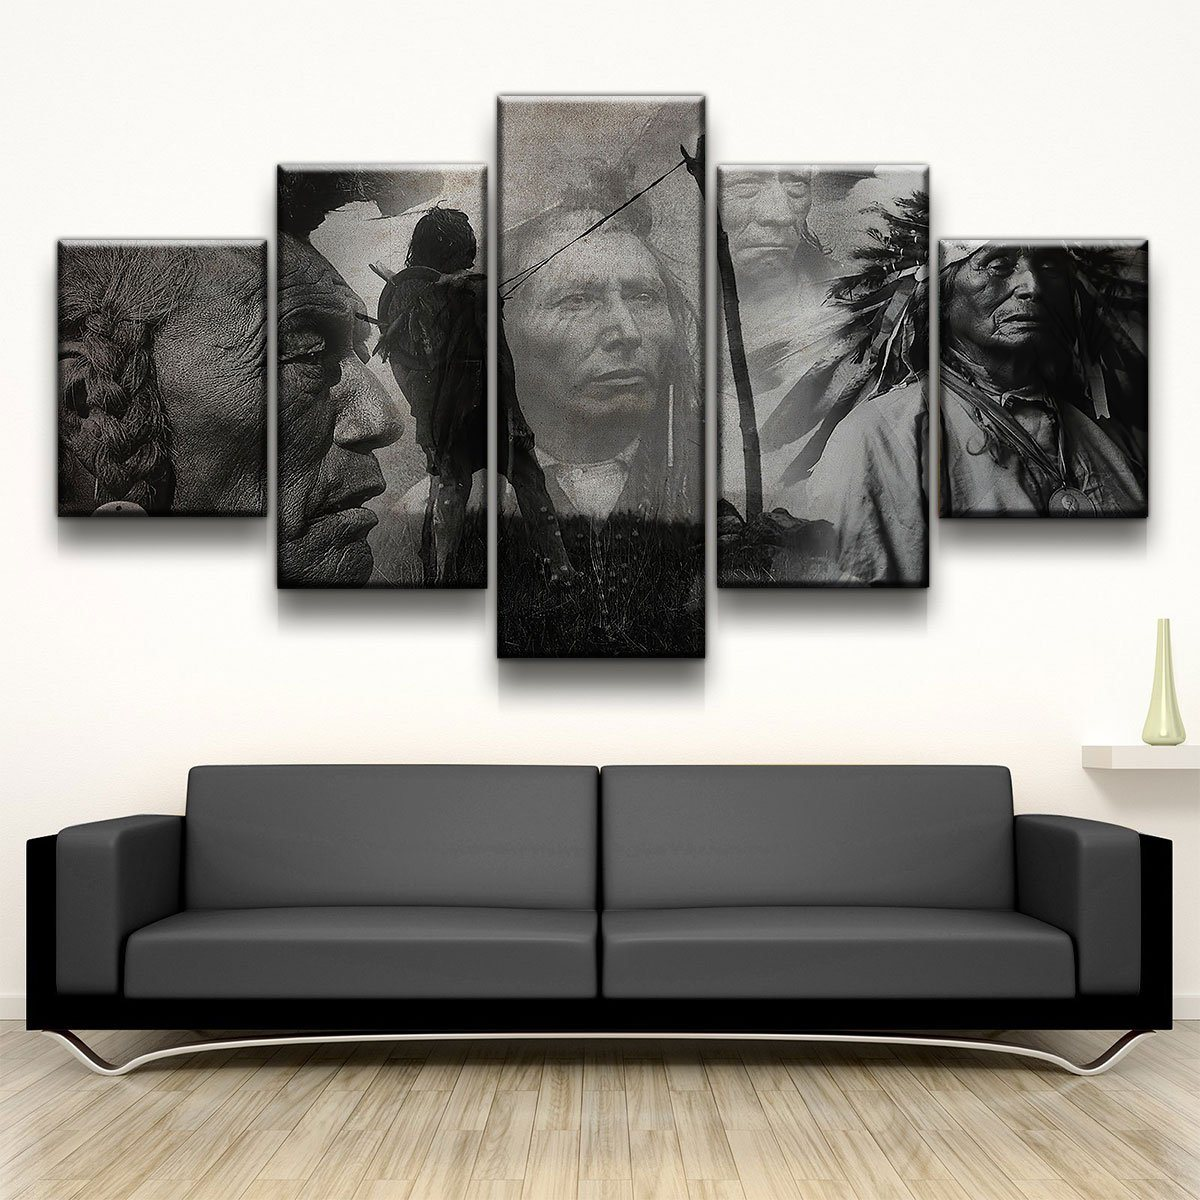 BW Native American 5 panel canvas wall art